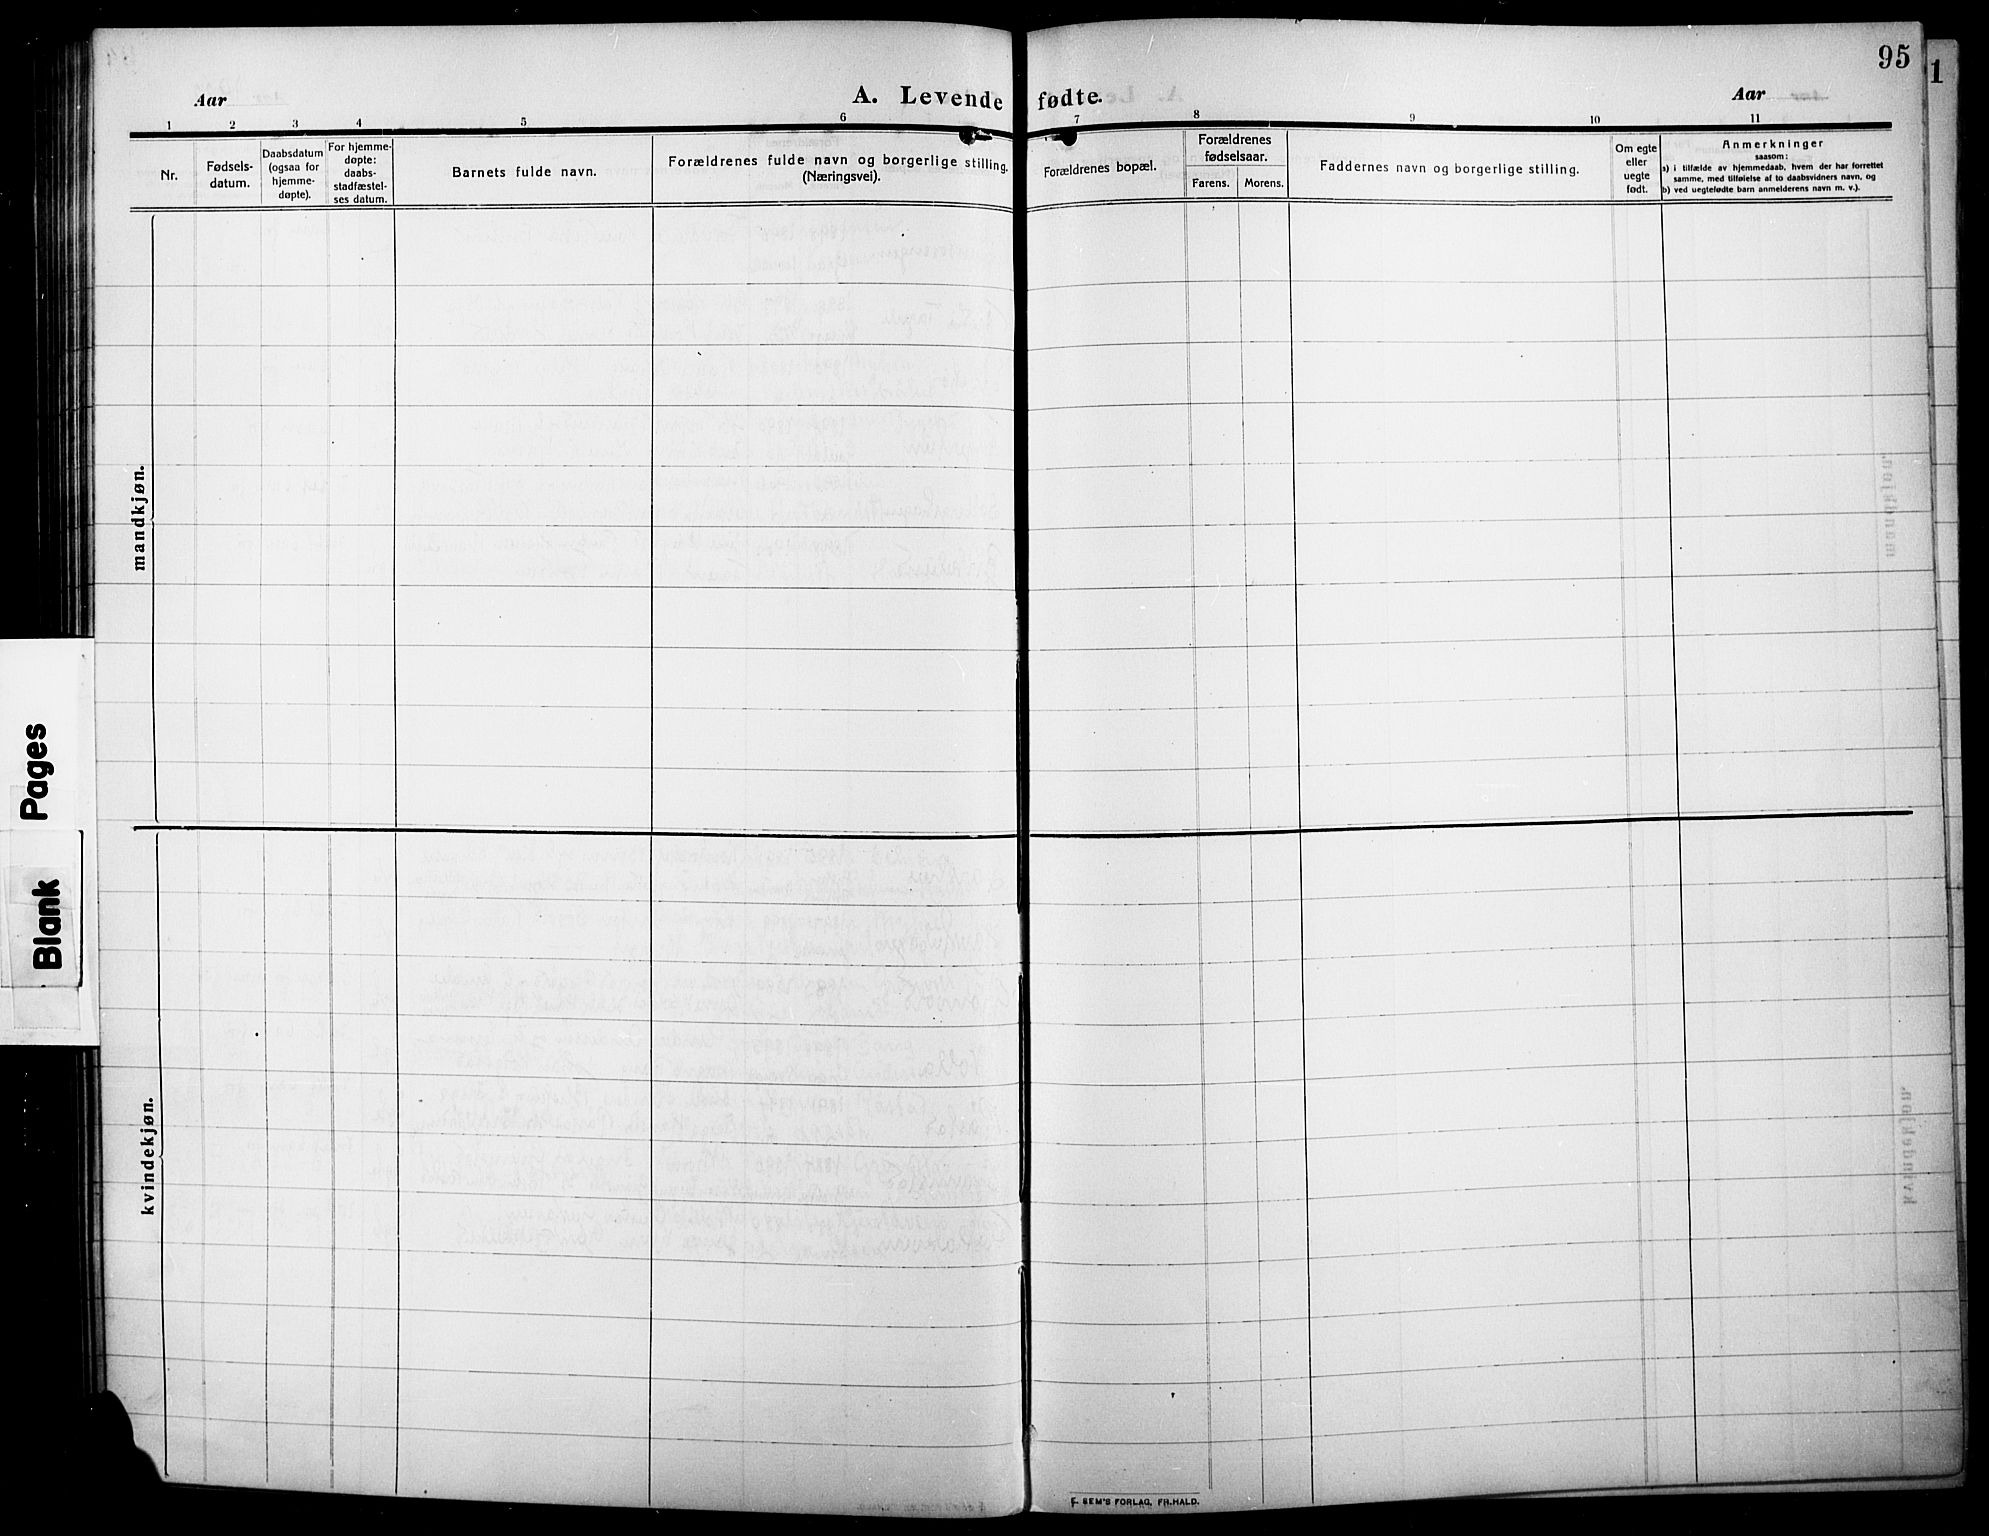 SAH, Lunner prestekontor, H/Ha/Hab/L0001: Klokkerbok nr. 1, 1909-1922, s. 95